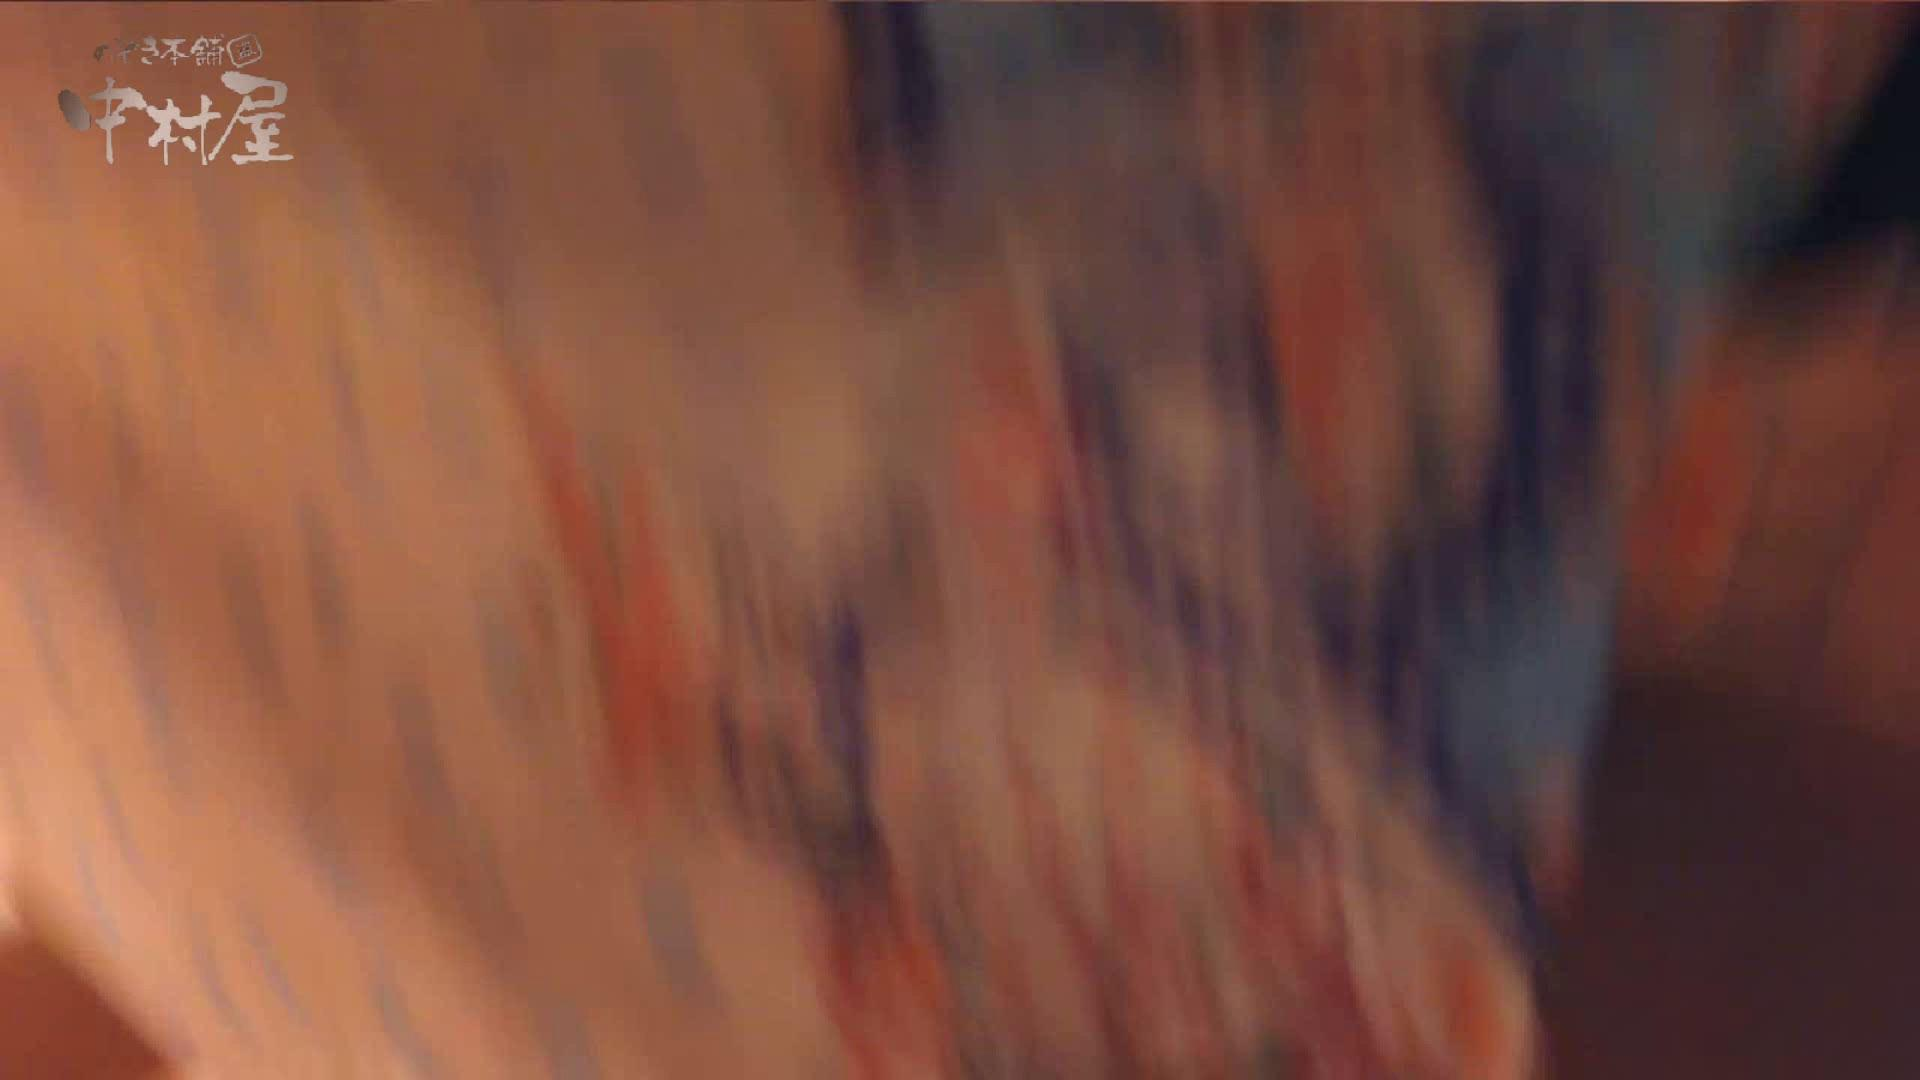 vol.69 美人アパレル胸チラ&パンチラ ストライプパンツみっけ! パンチラ | OLのエロ生活  95連発 51